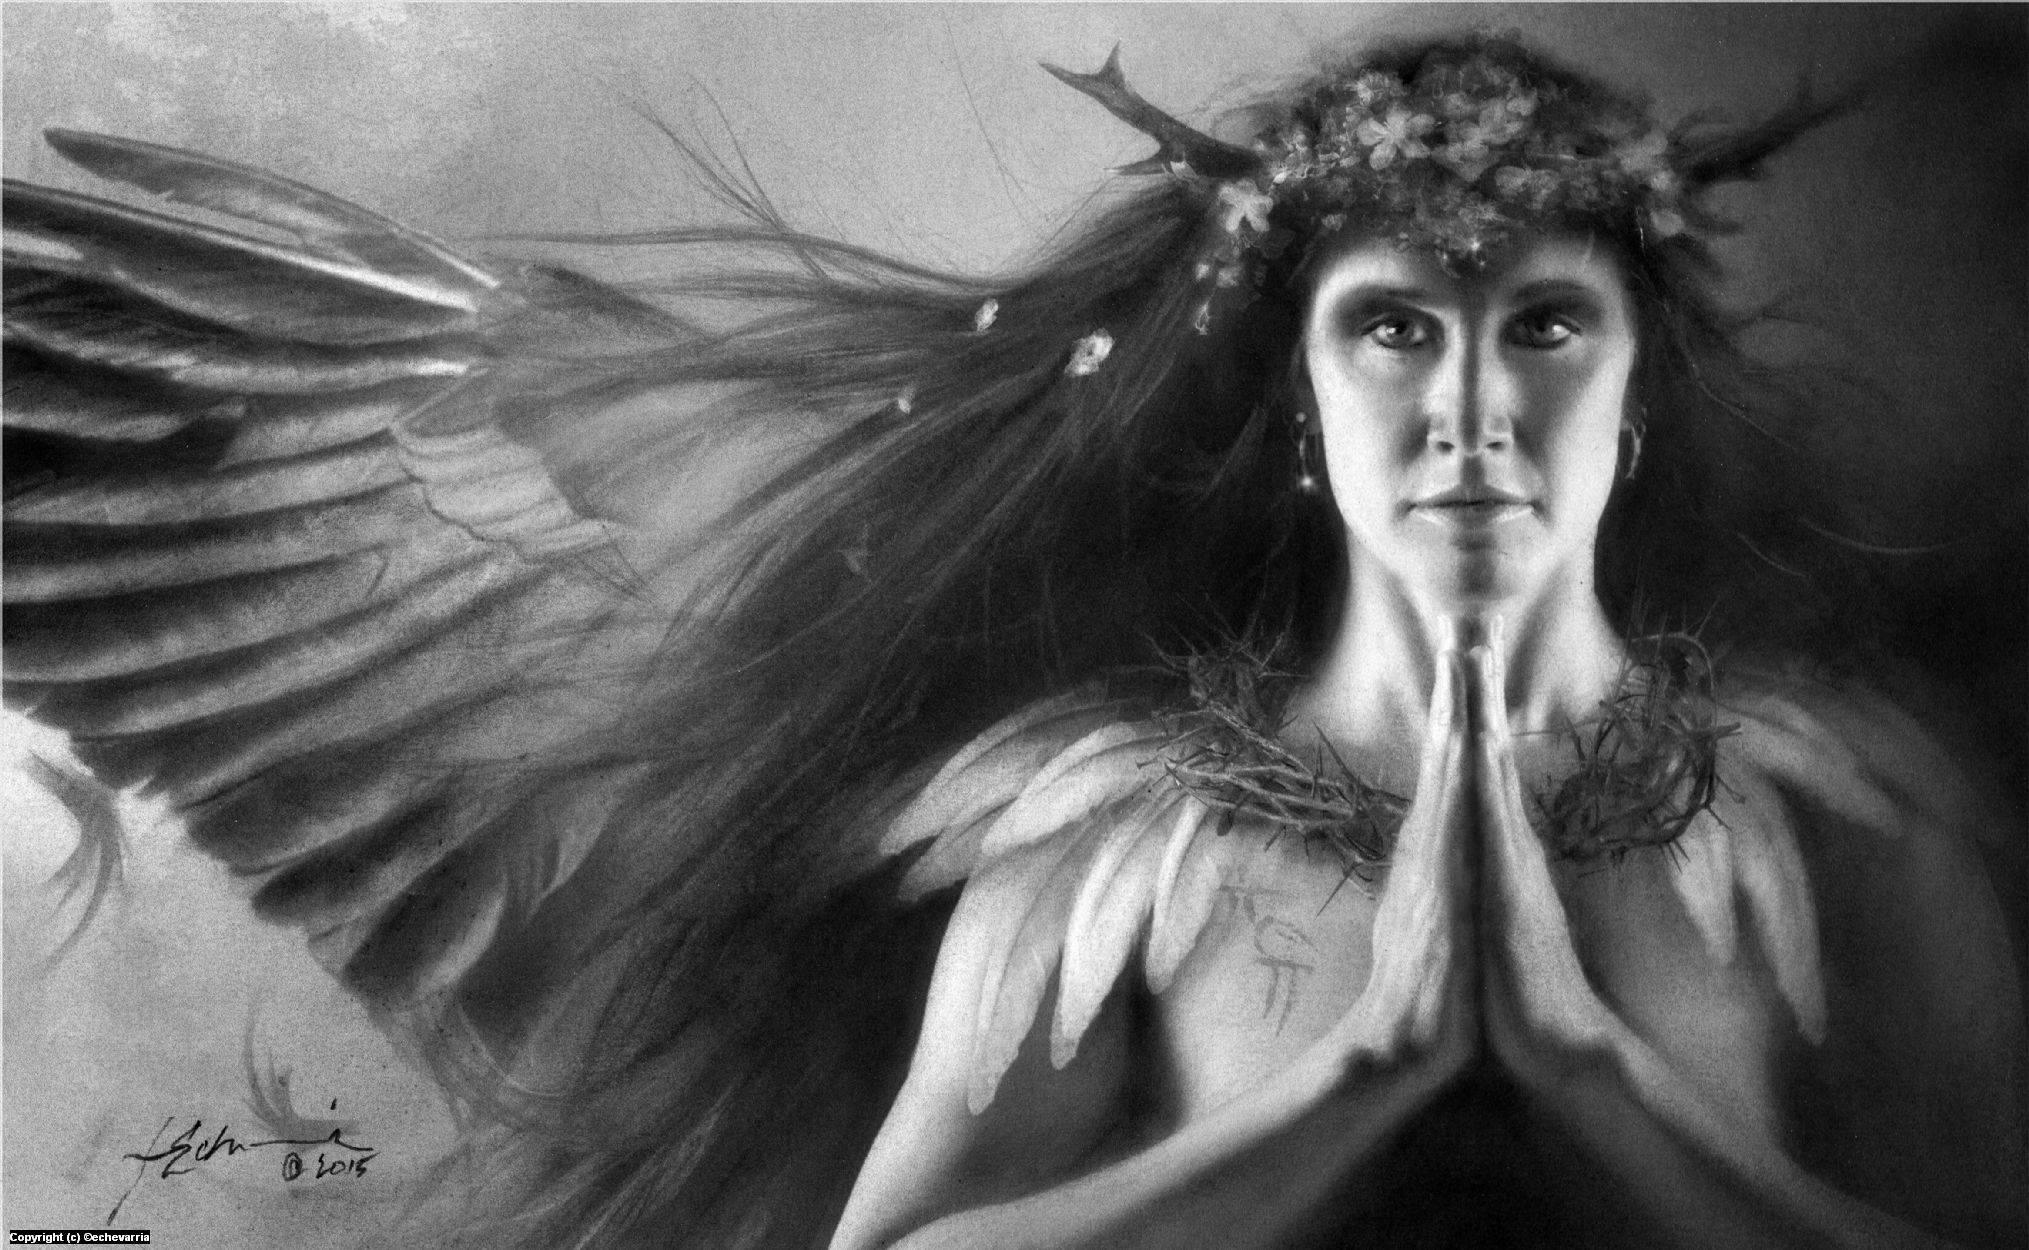 Shape Shifter • Druid High Priestess Artwork by Jeff Echevarria